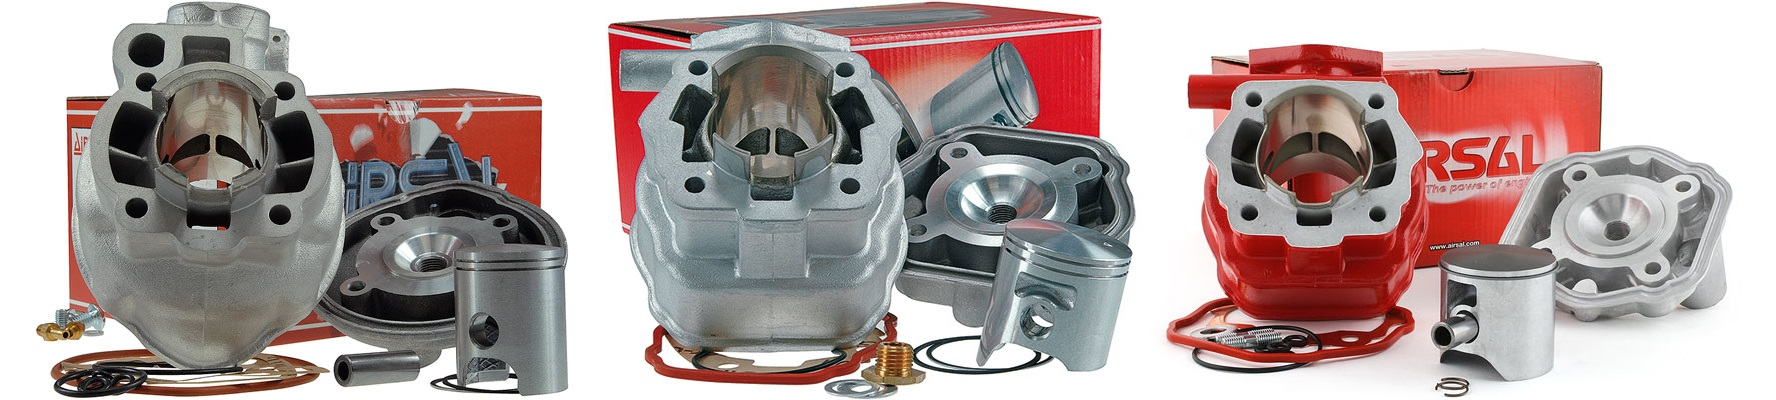 Cylindres aluminium Airsal